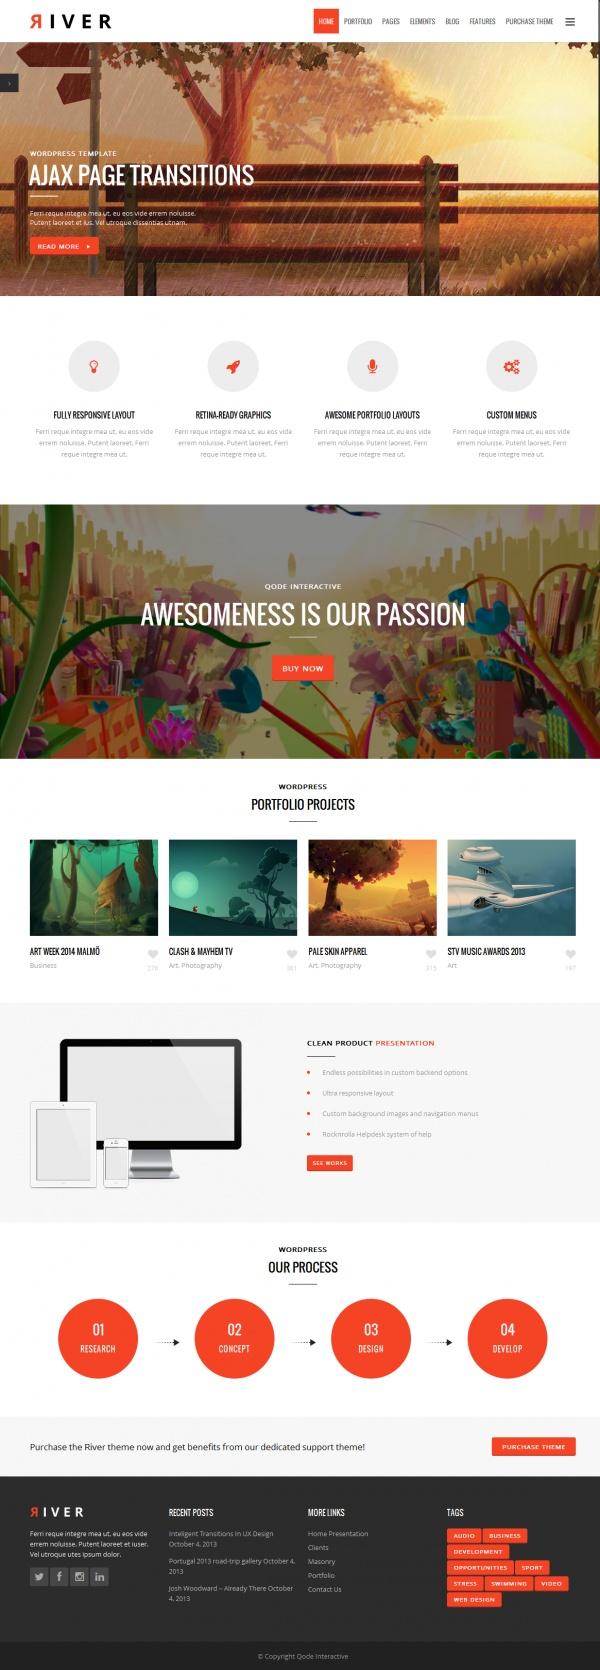 River Best Creative WordPress Themes June